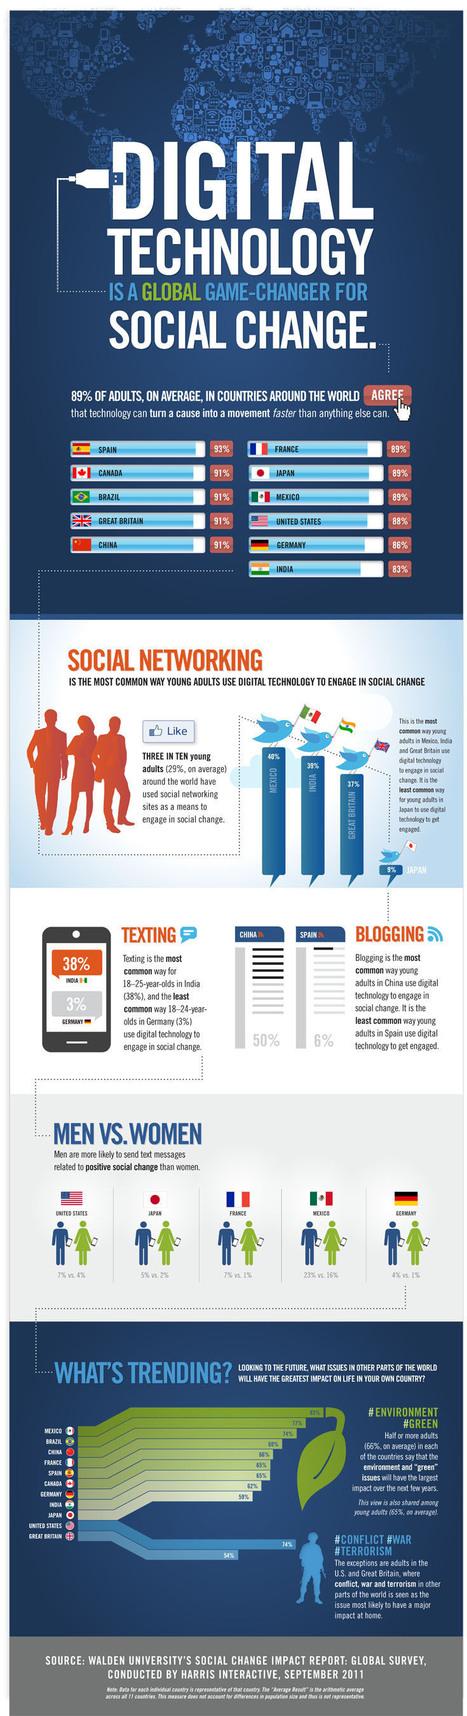 Digital technology driving global social change | Twit4D | Scoop.it